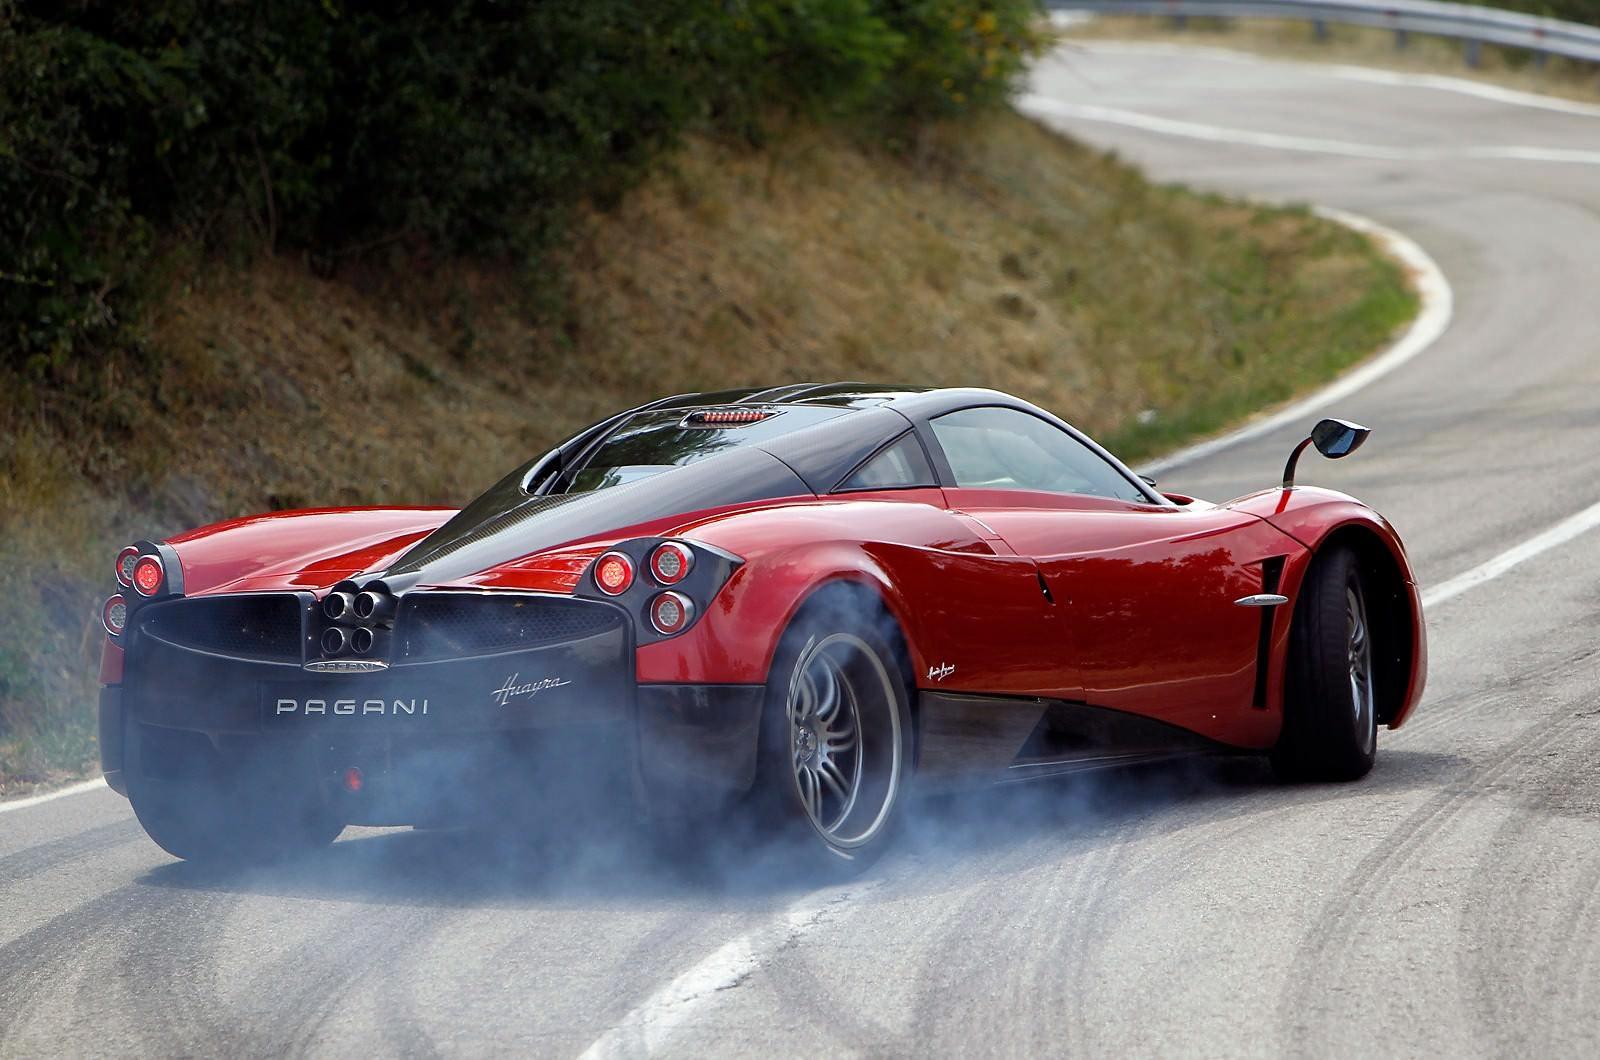 29-epic-red-pagani-huayra-drifting